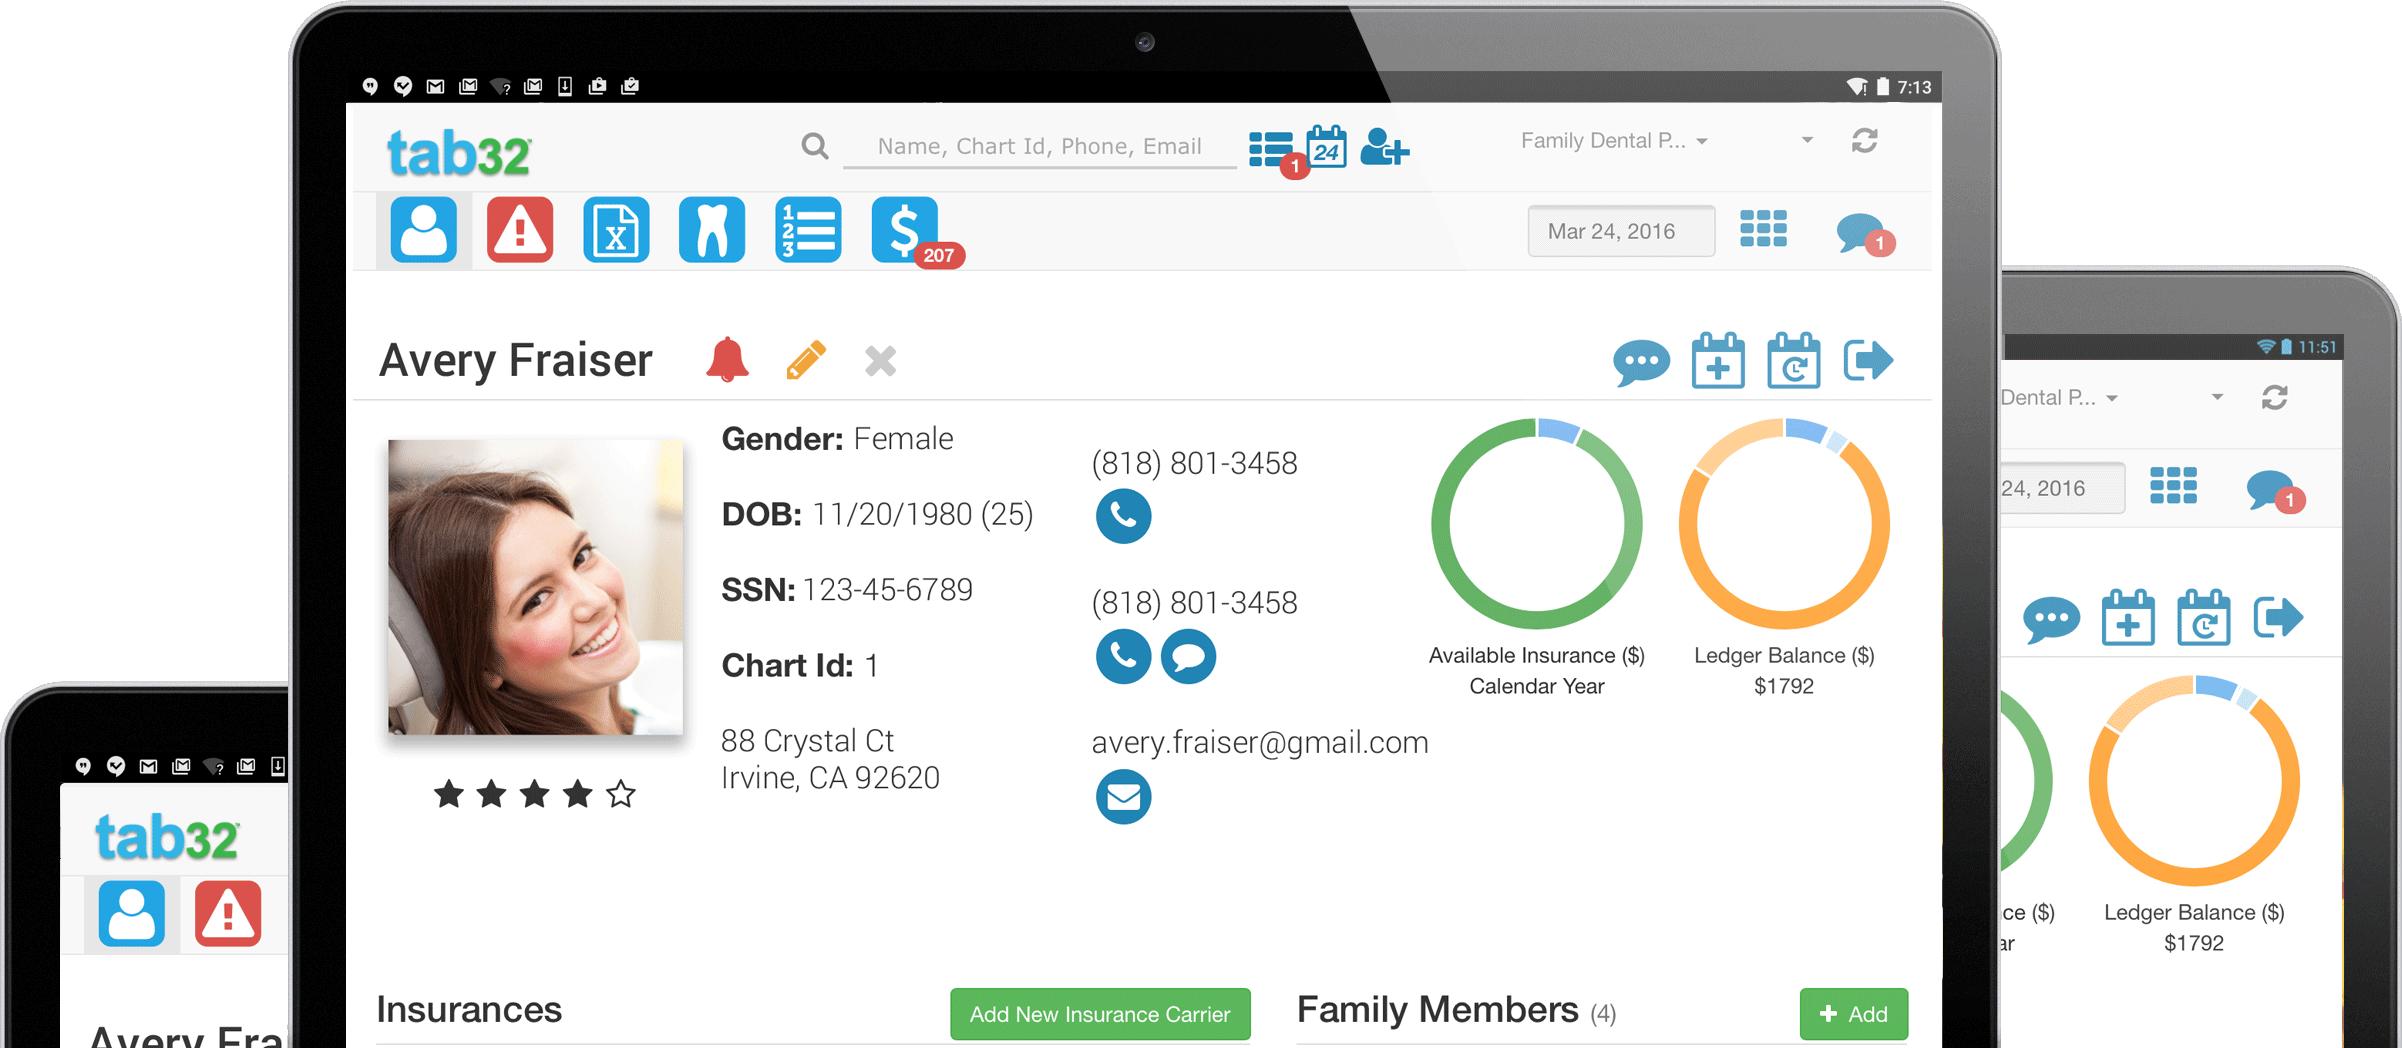 ReleasingHelloPatient a real-time Patient Communication System